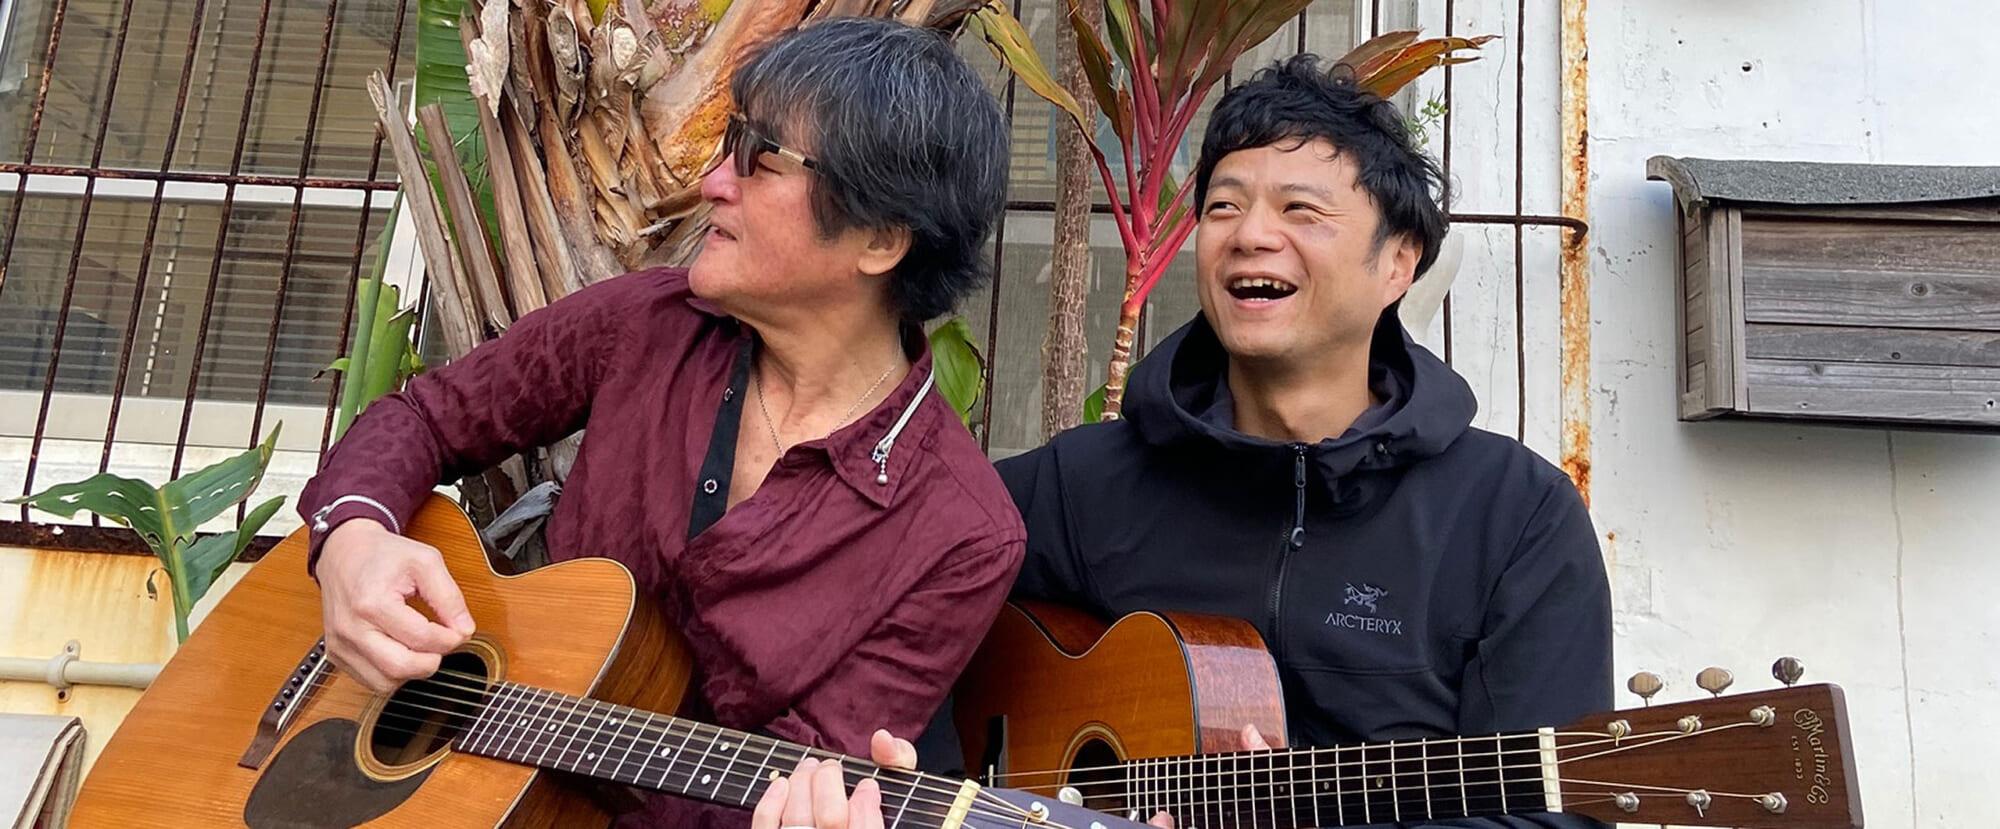 Interview|奇妙礼太郎×内田勘太郎 『アイコトバハ』で感じた名コンビっぷり